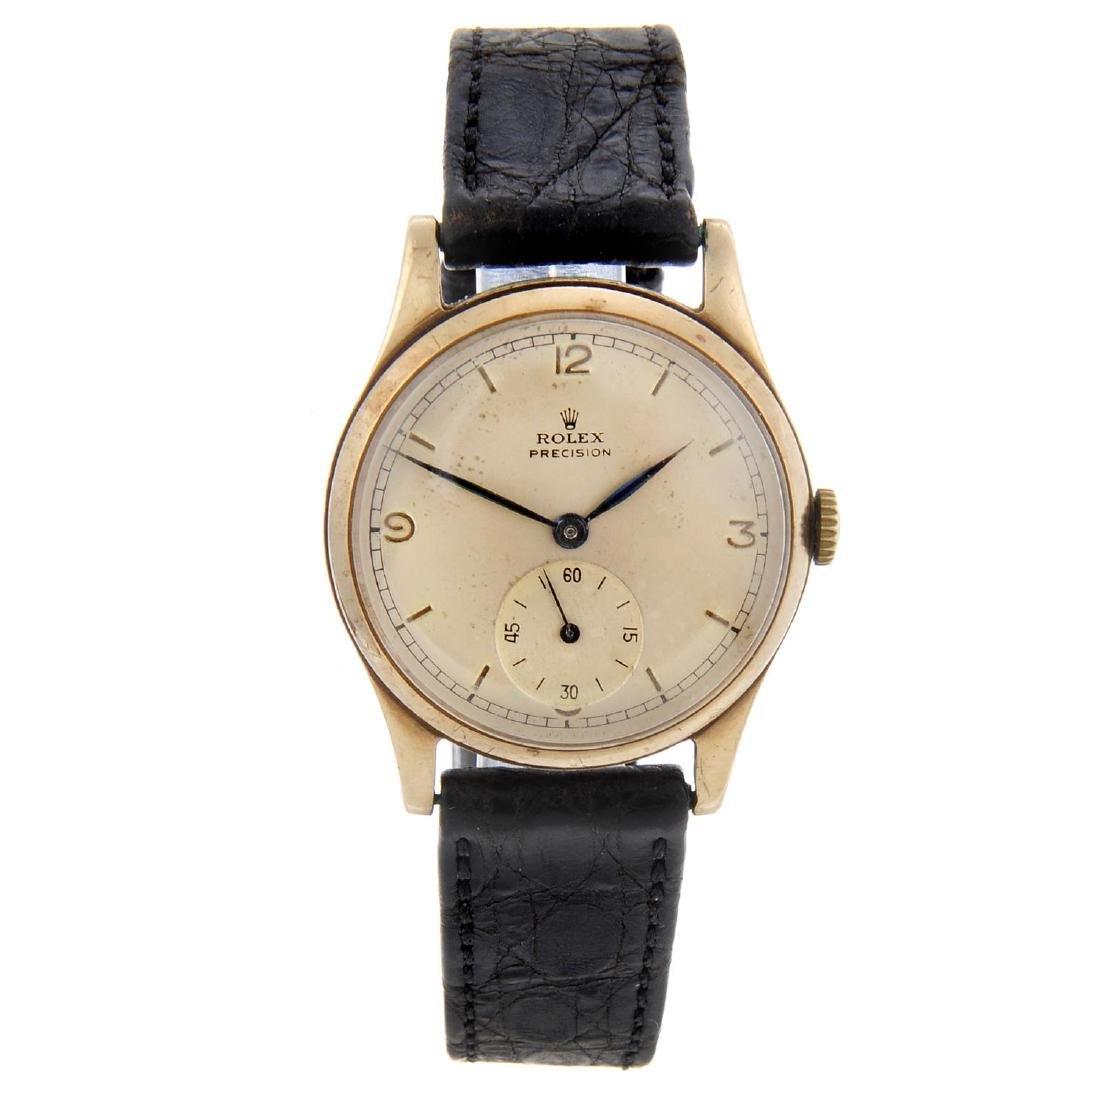 ROLEX - a gentleman's Precision wrist watch. 9ct yellow